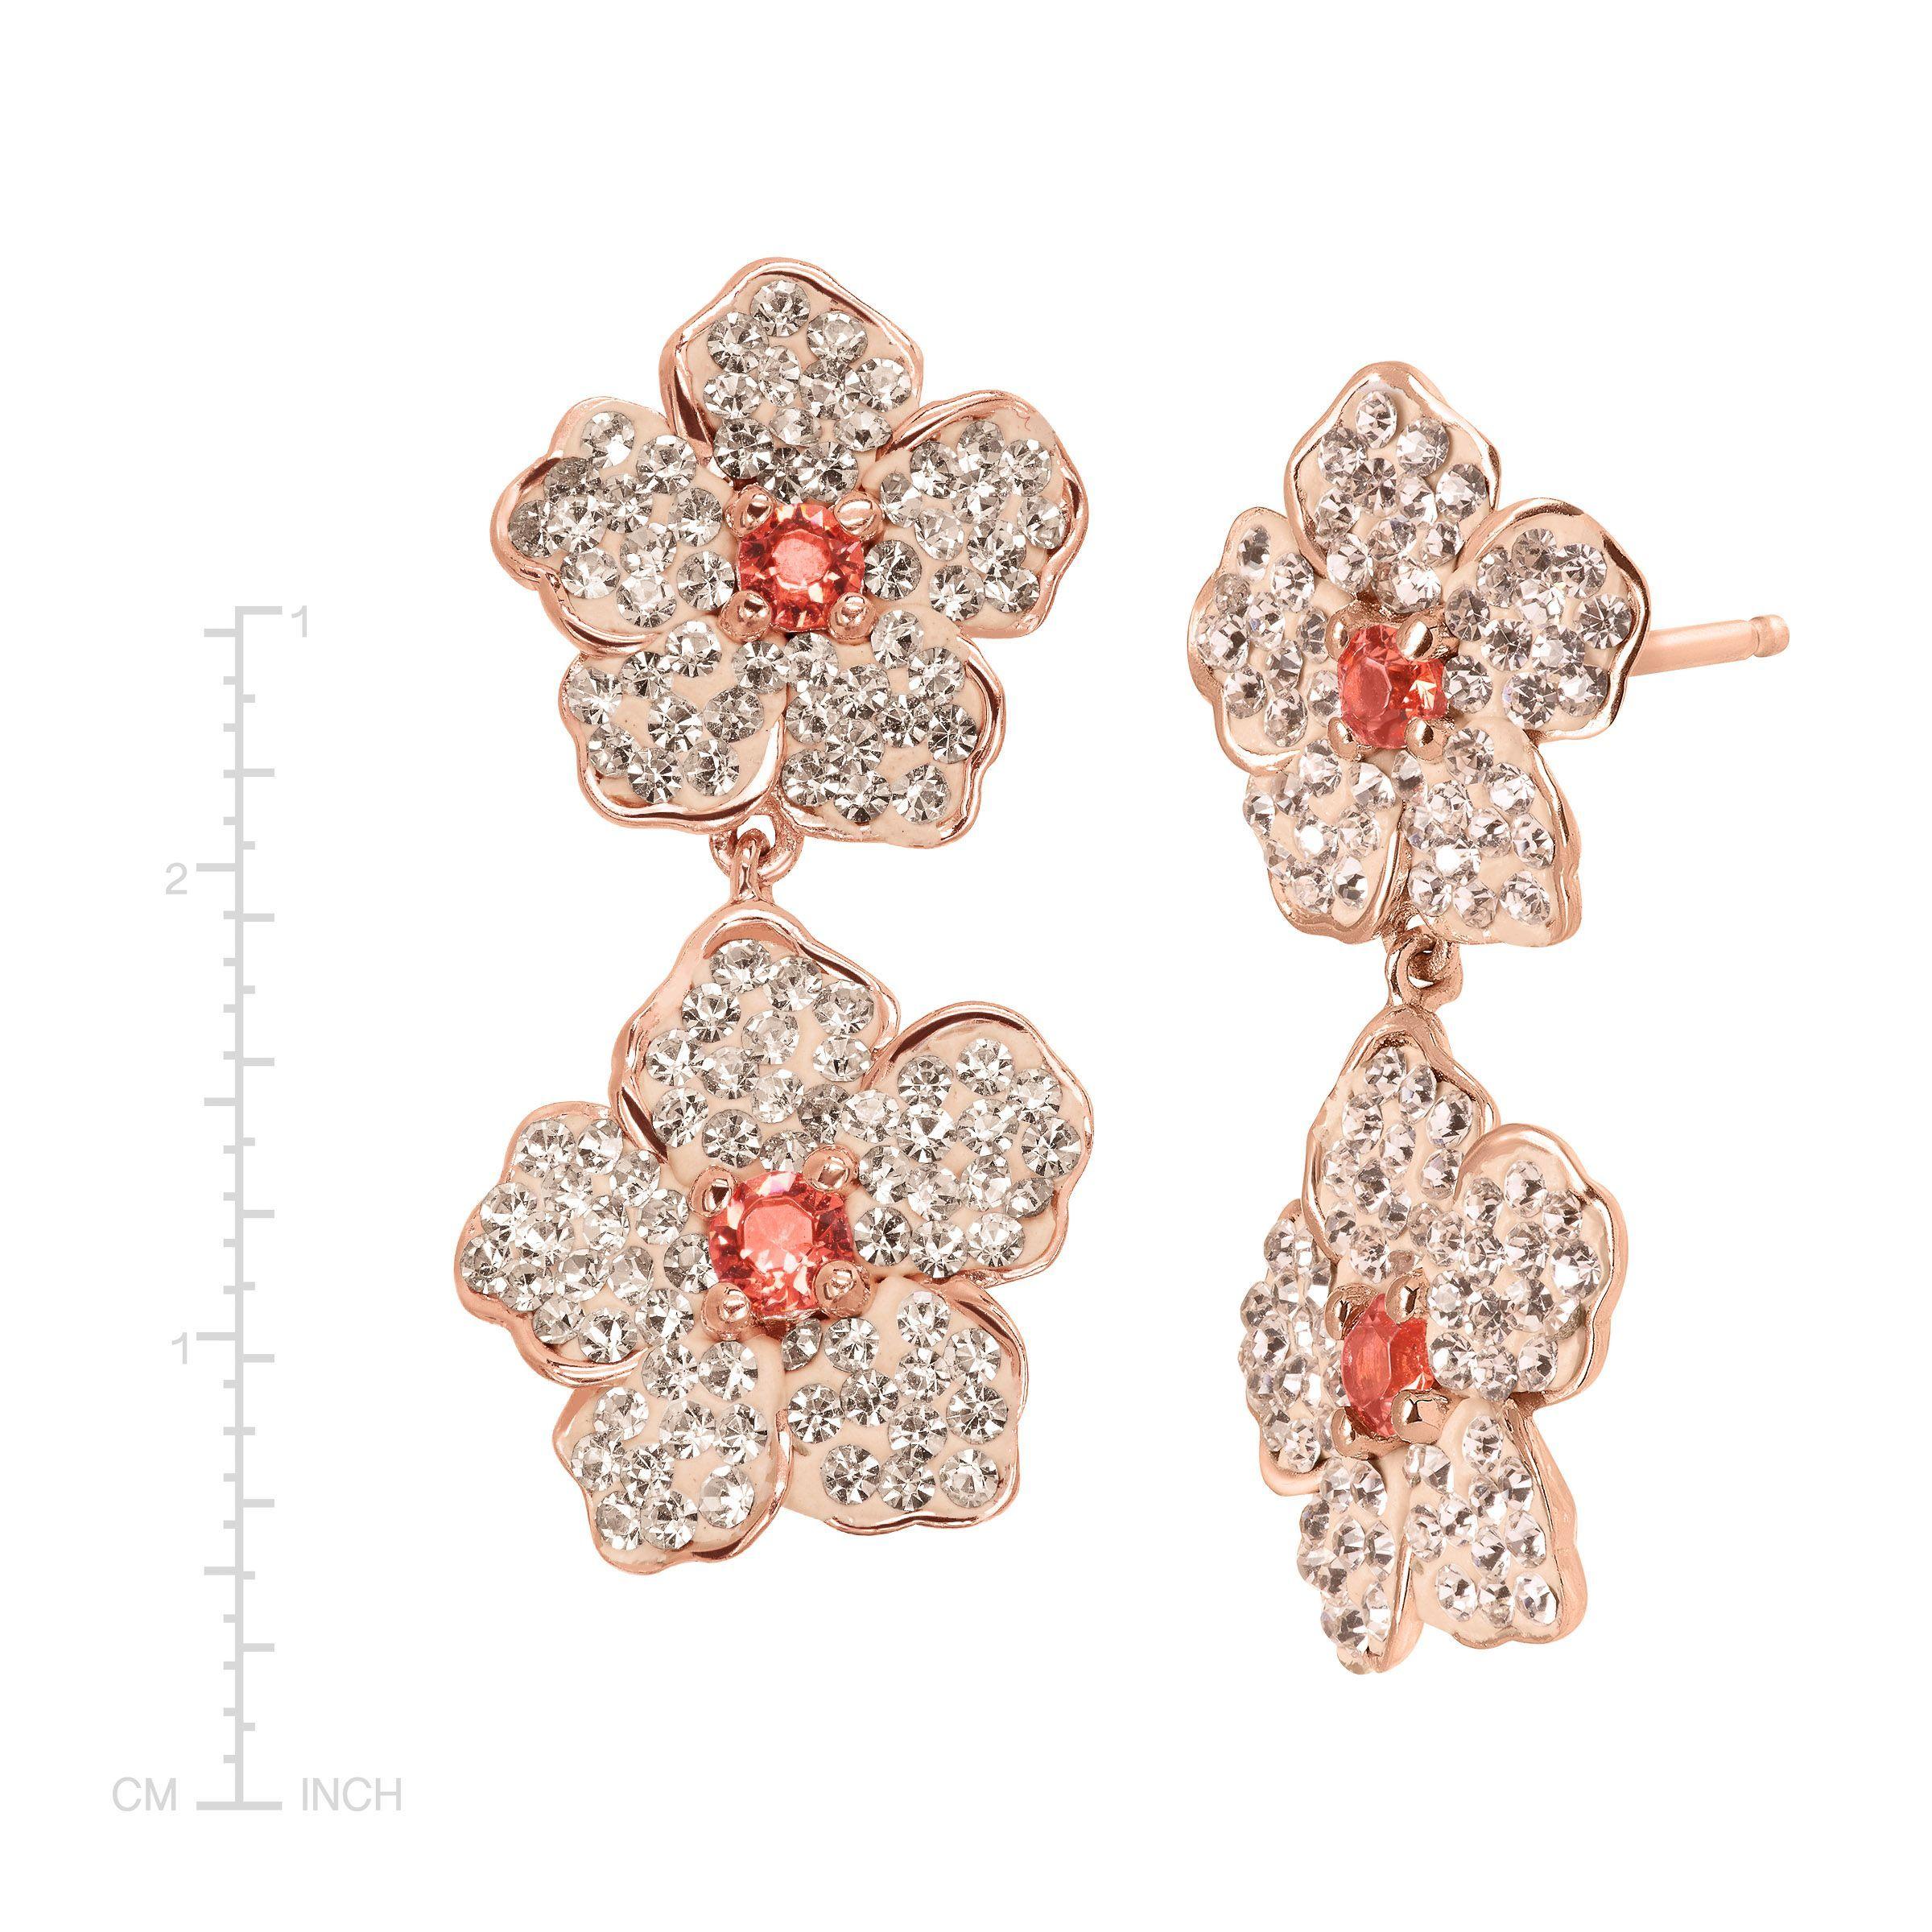 863311dc6a Crystaluxe Flower Drop Earrings W Swarovski Crystals 18k Rose Gold